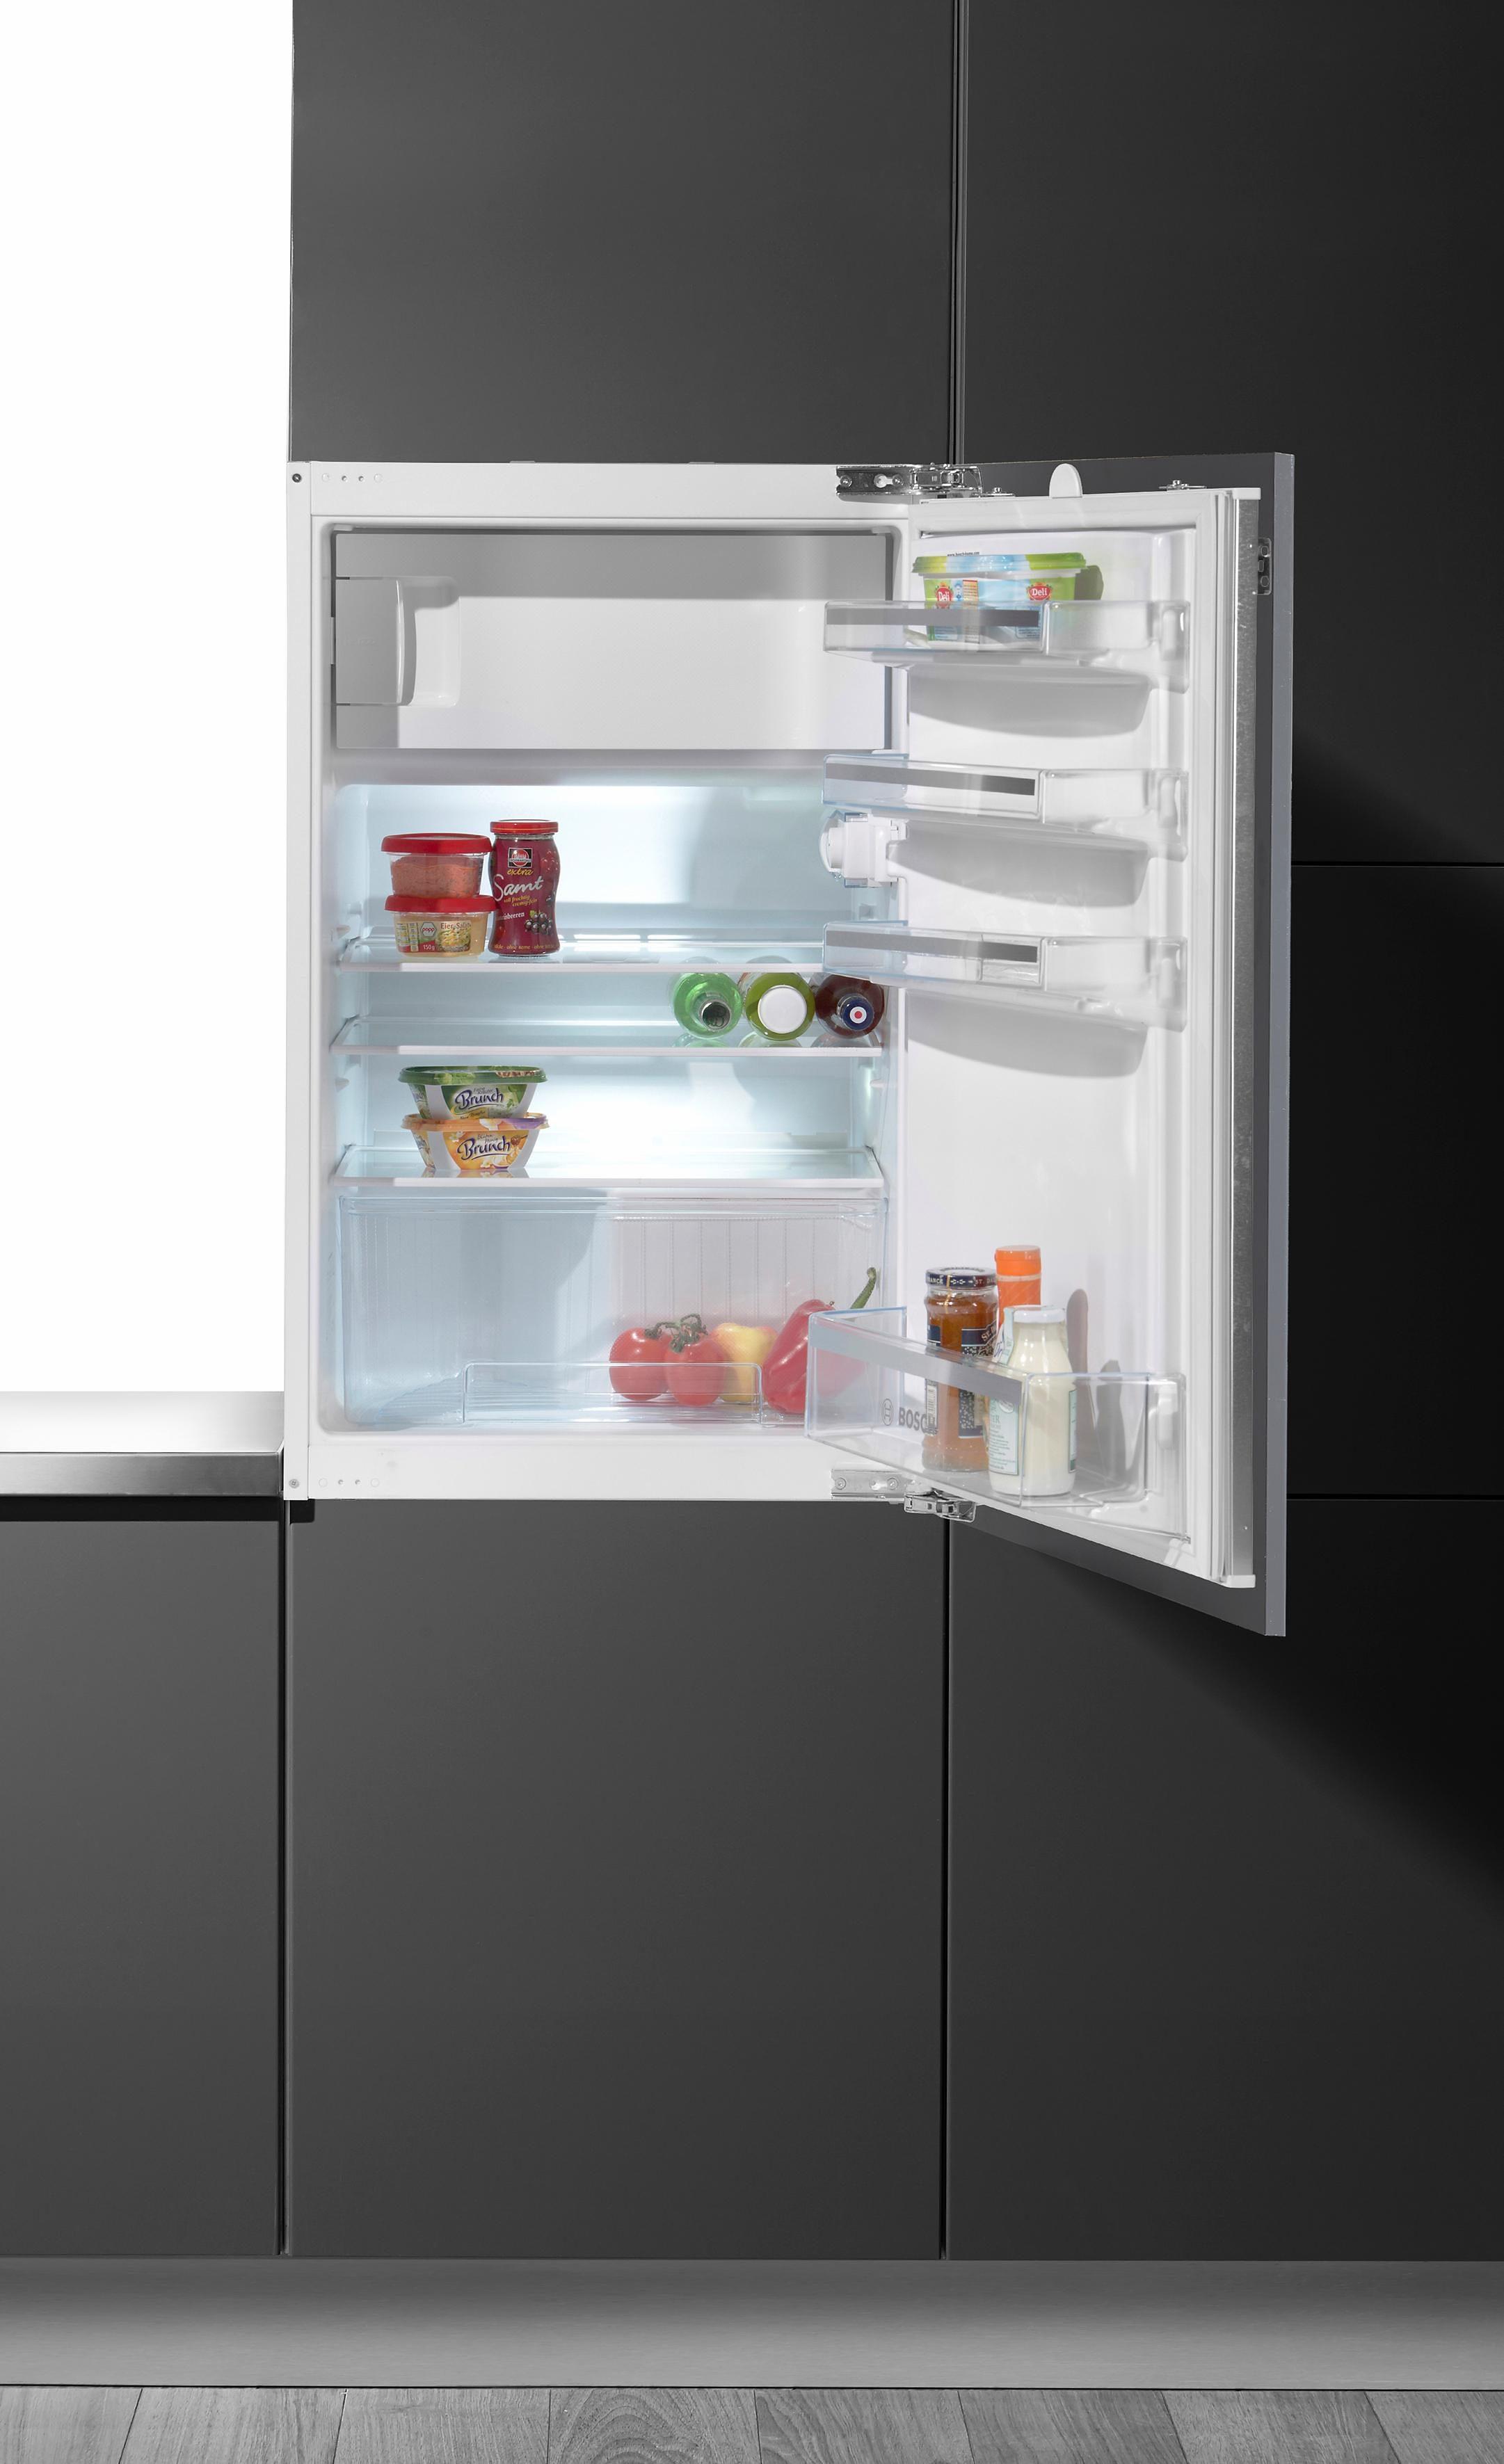 Bosch integrierbarer Einbau-Kühlschrank KIL18V60, A++, 88 cm